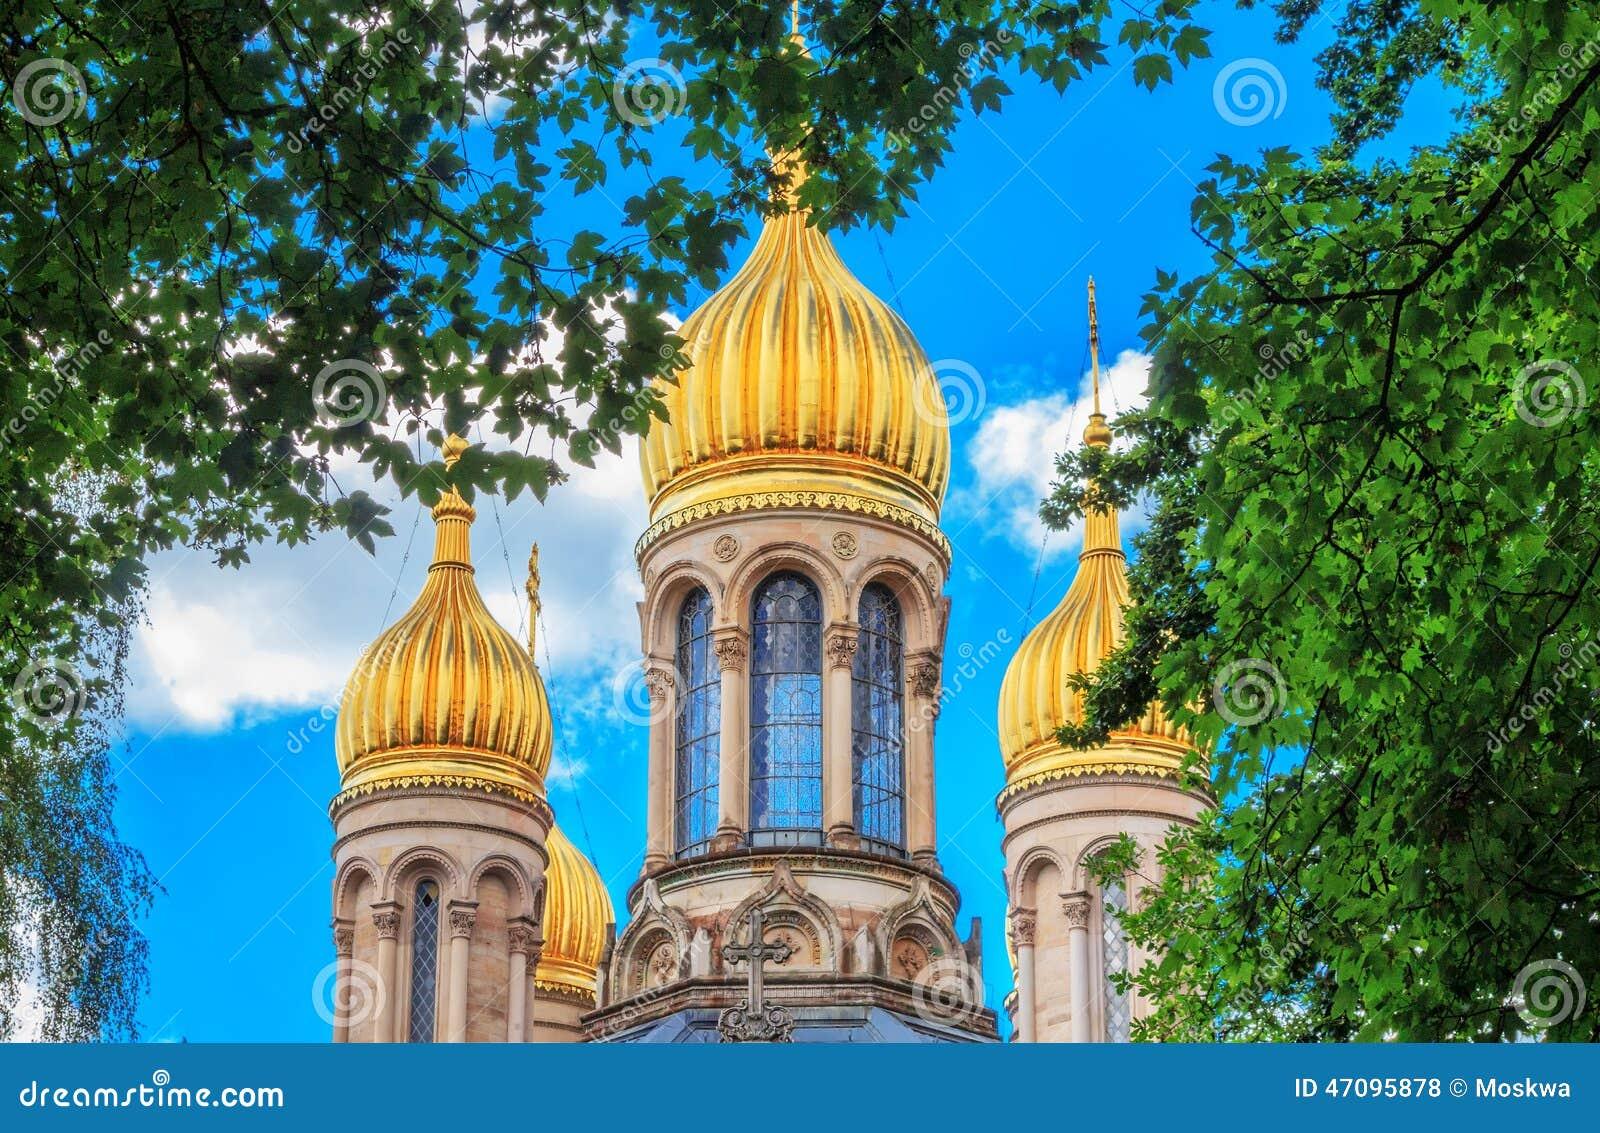 Chiesa ortodossa russa a Wiesbaden, Germania